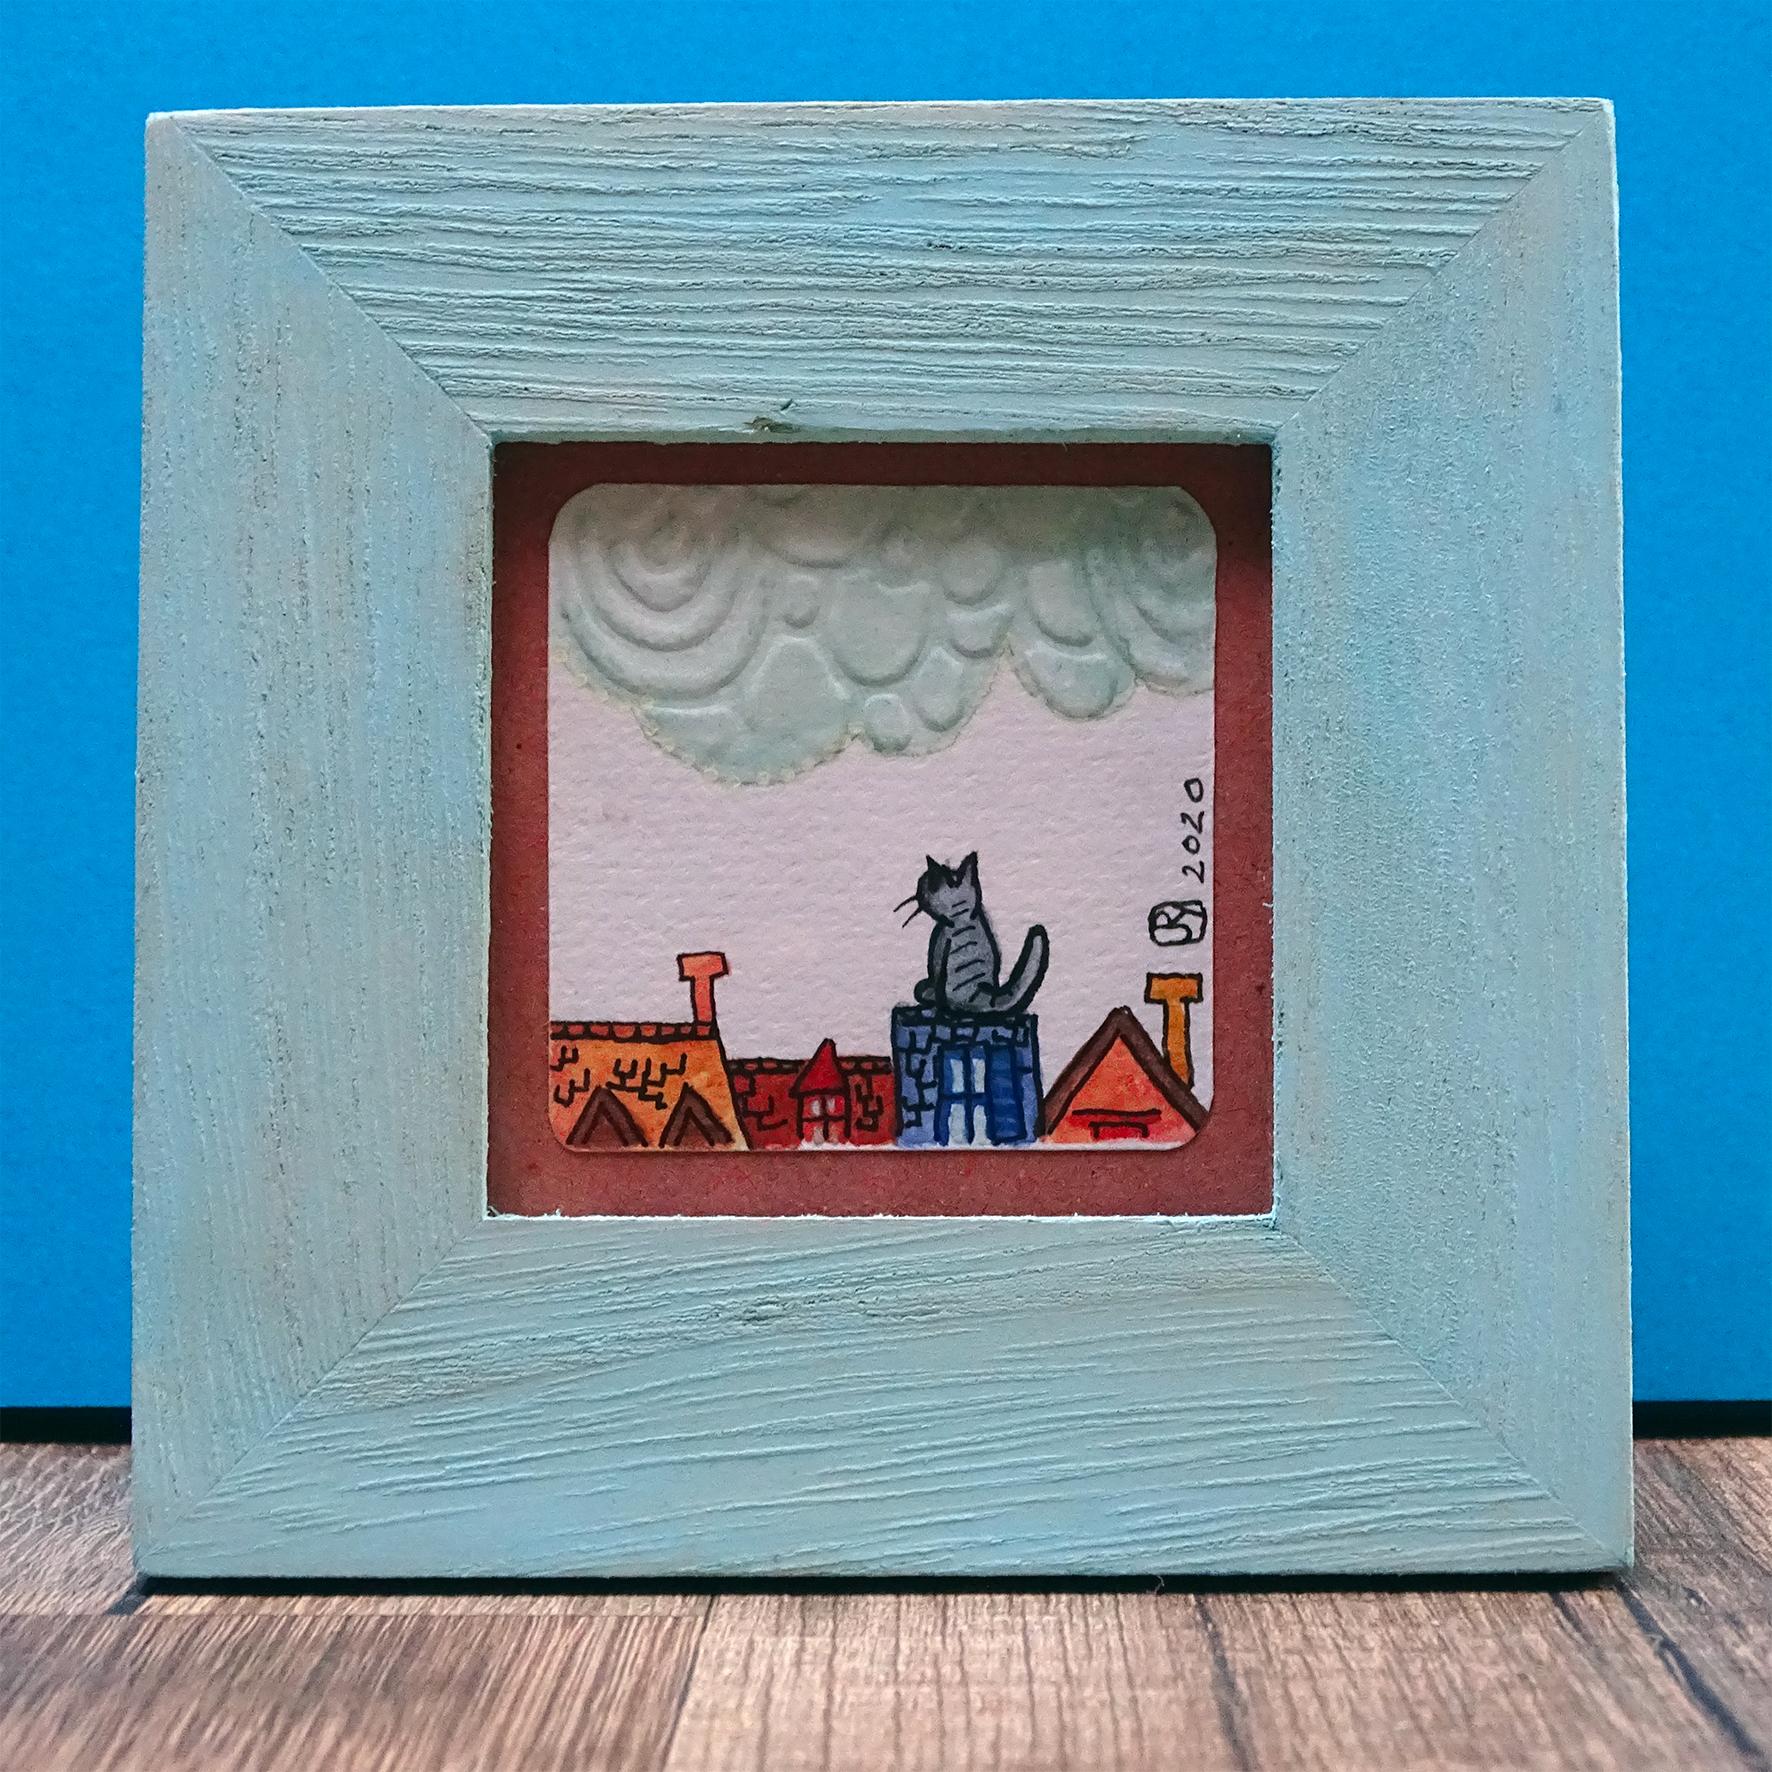 """Par dessus les toits 2"" ©Julia Ratsimandresy / Mini-aquarelle encadrée / Cadre bois bleu+verre 10x10 cm / 15€ hors fdp /Exemplaire unique!"